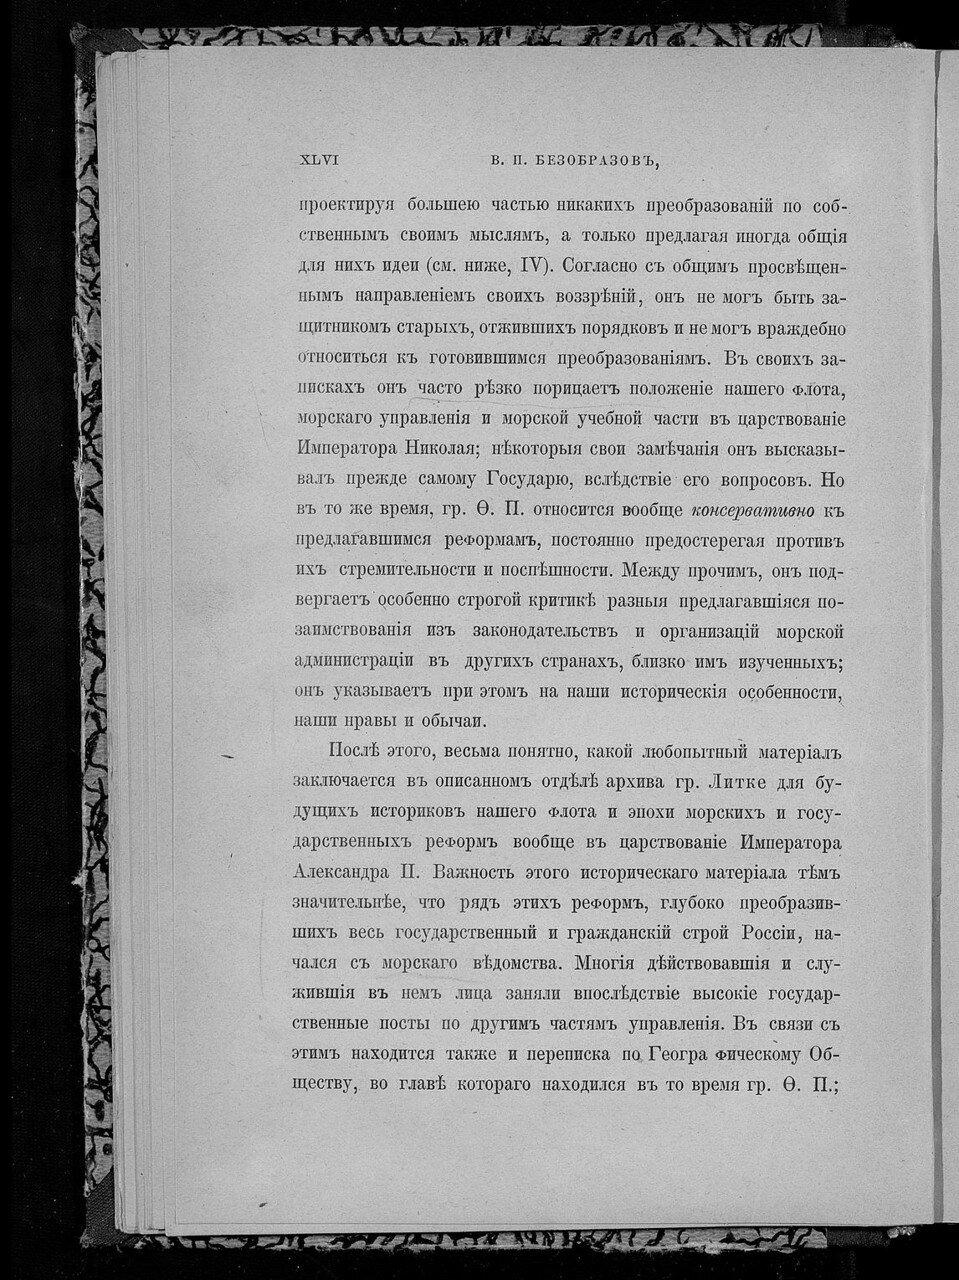 https://img-fotki.yandex.ru/get/769553/199368979.d2/0_21dd80_94aa446e_XXXL.jpg